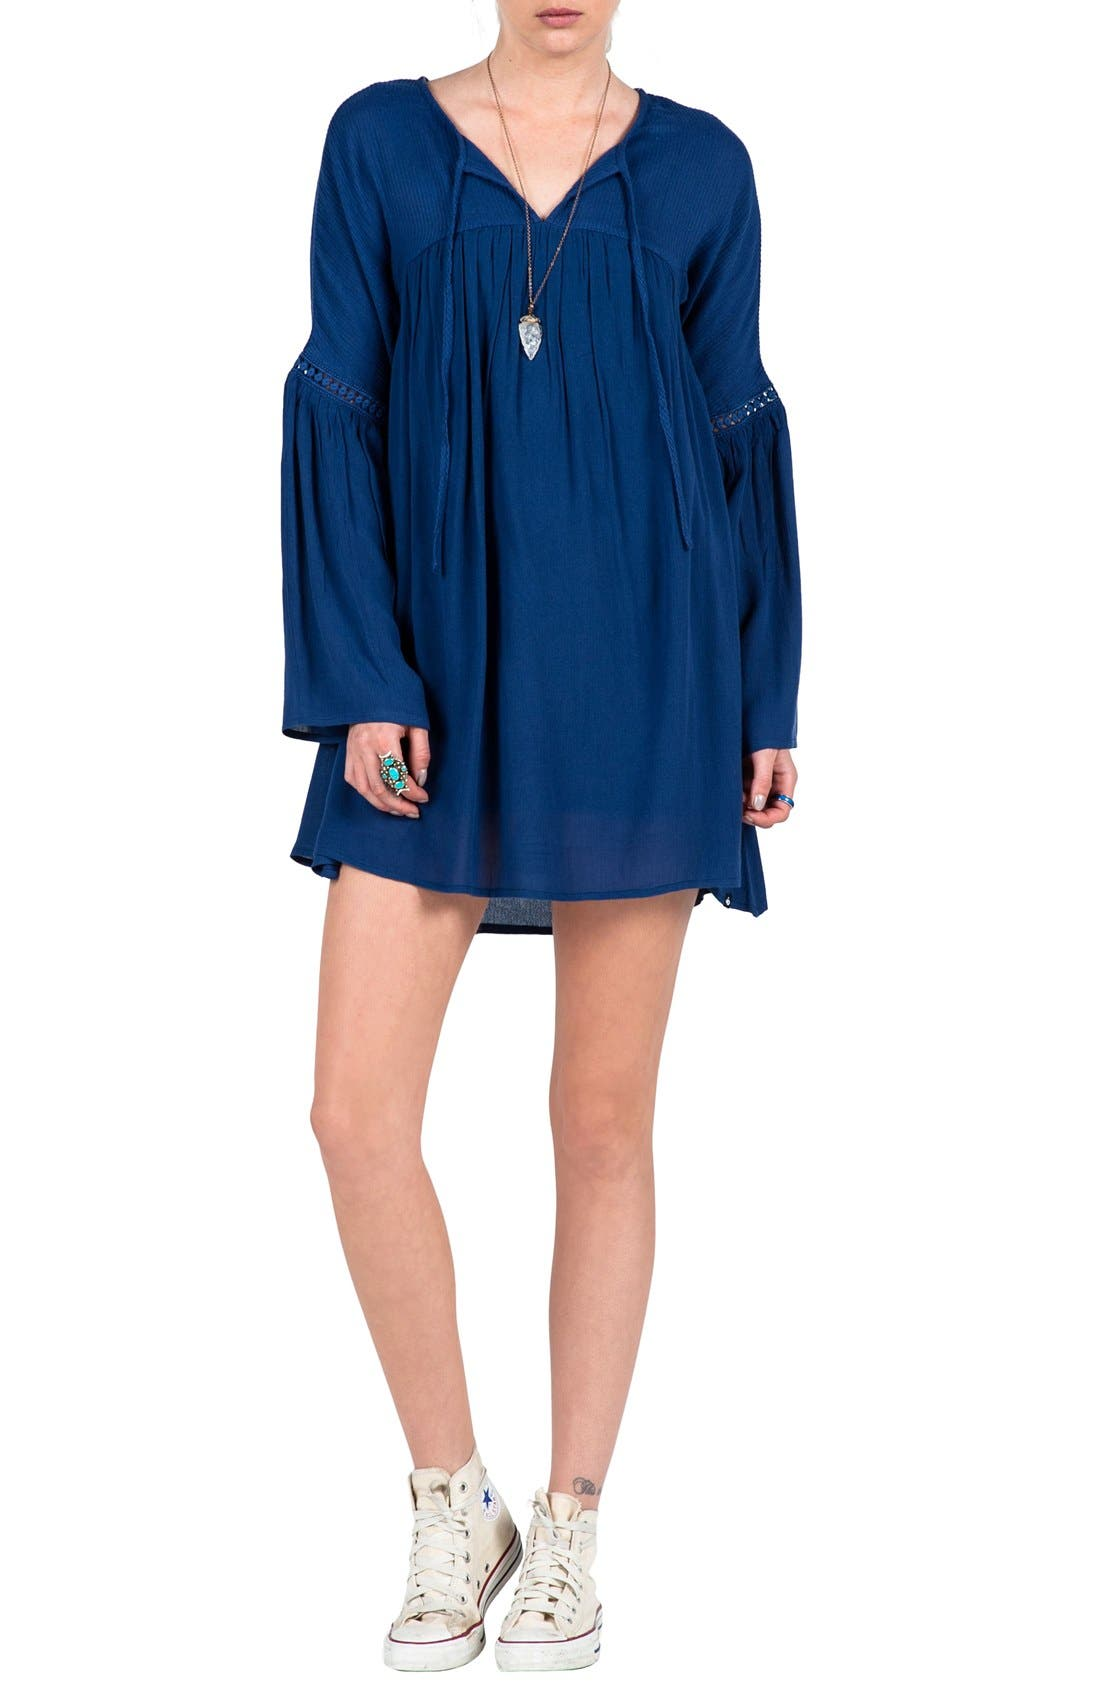 VOLCOM 'Peaceazy' Babydoll Dress, Main, color, 410